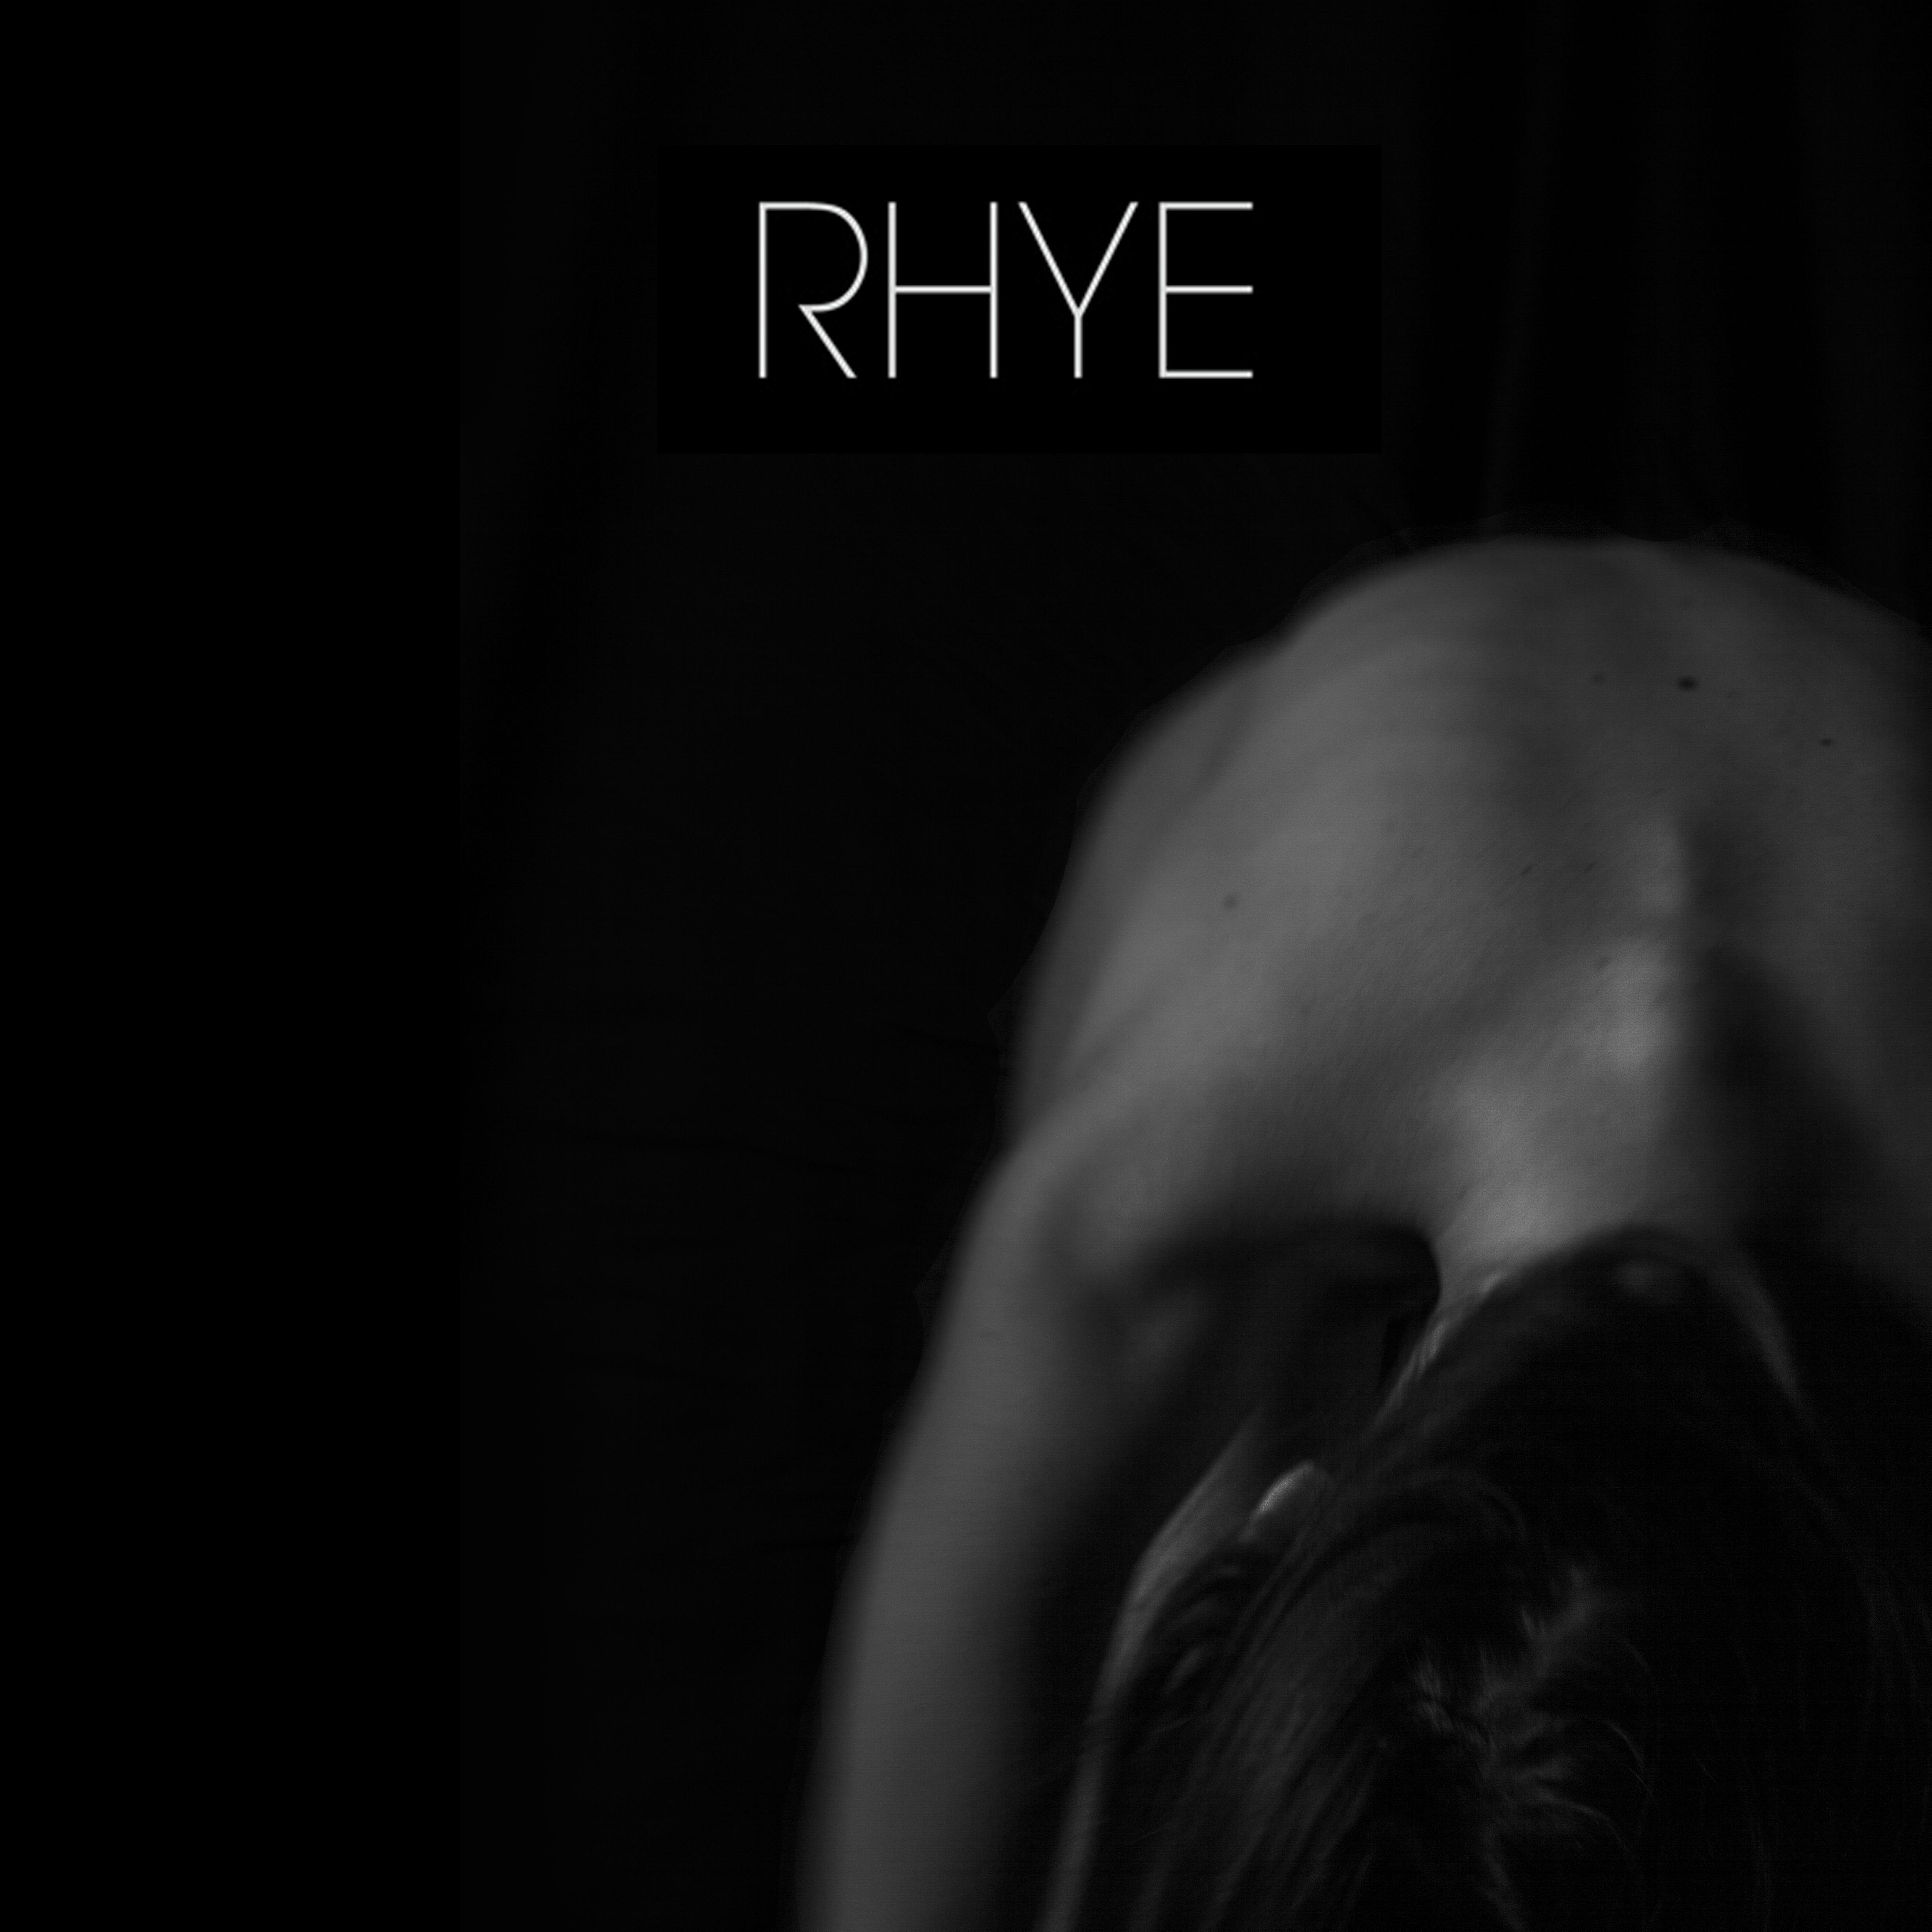 rhyepress Disrupting the Darkness: St. Vincent, Blondie, and Rhye on David Lynch